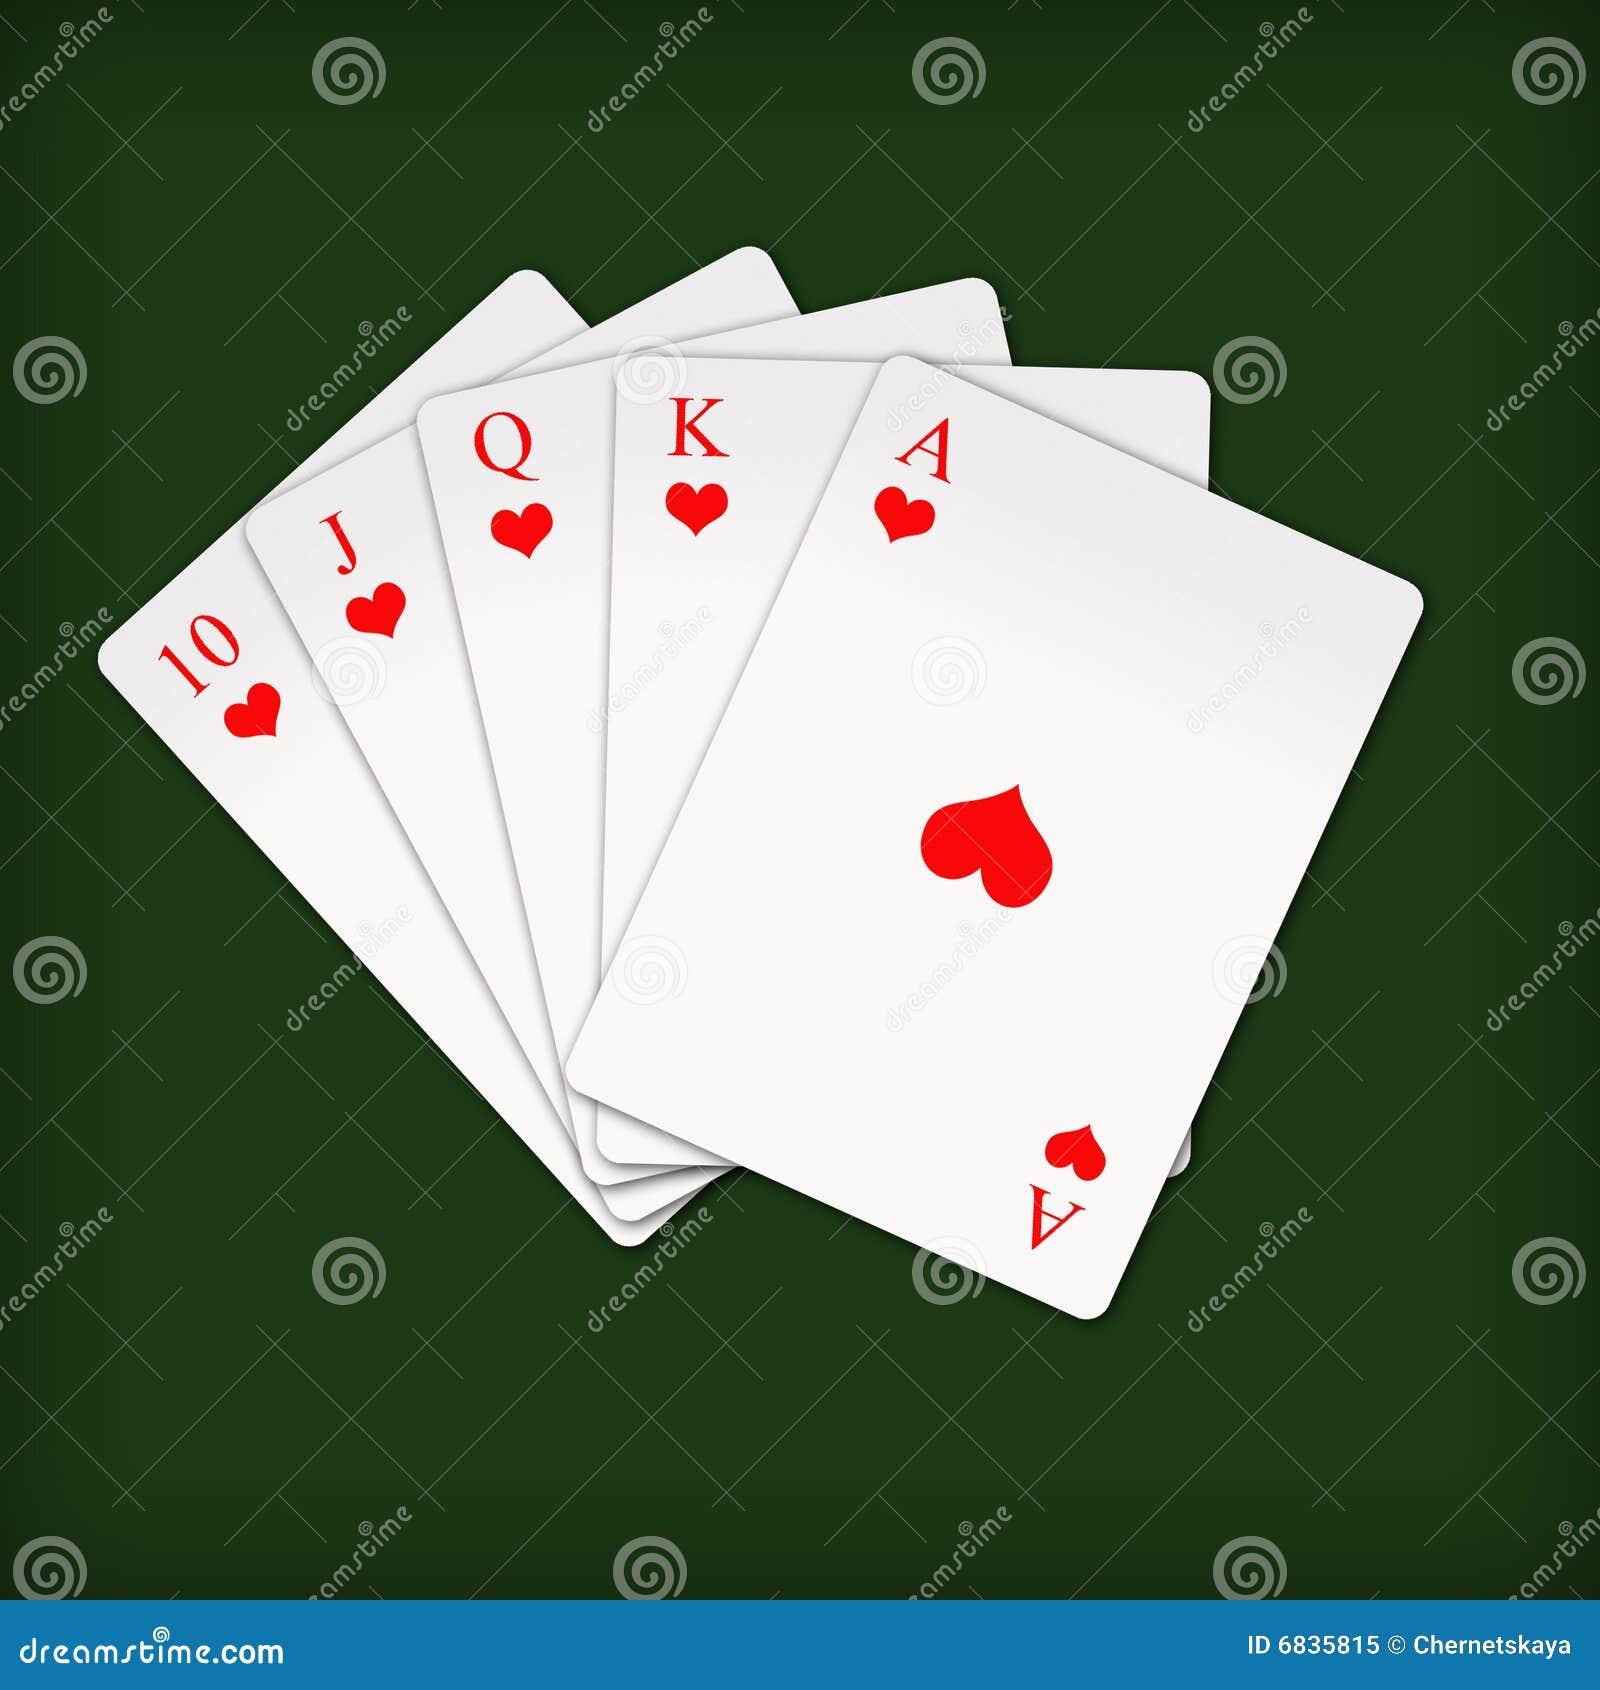 Poker variant cards casino royale drink recipe